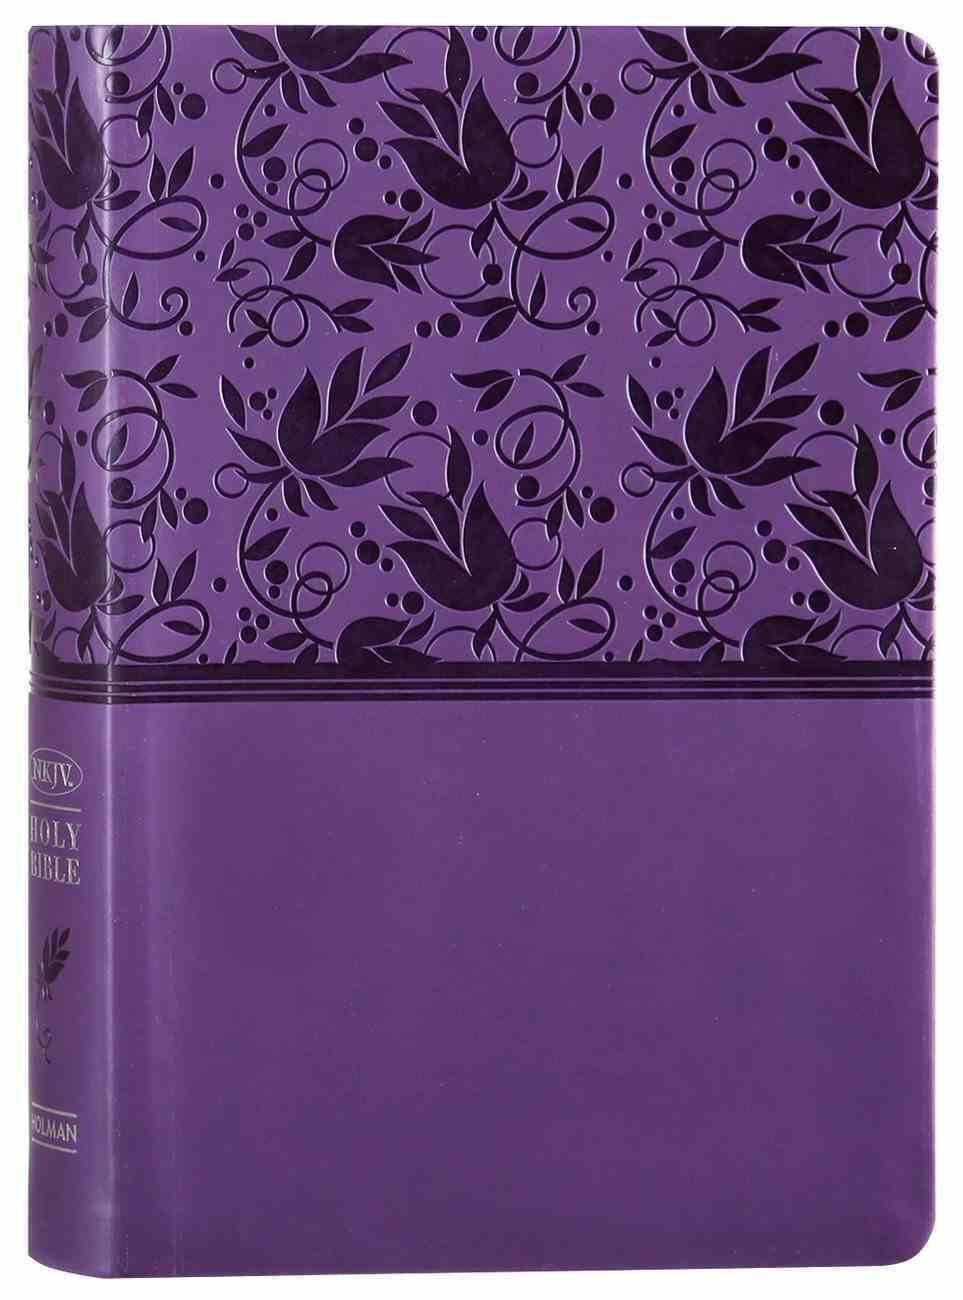 NKJV Large Print Personal Size Reference Bible Purple Premium Imitation Leather